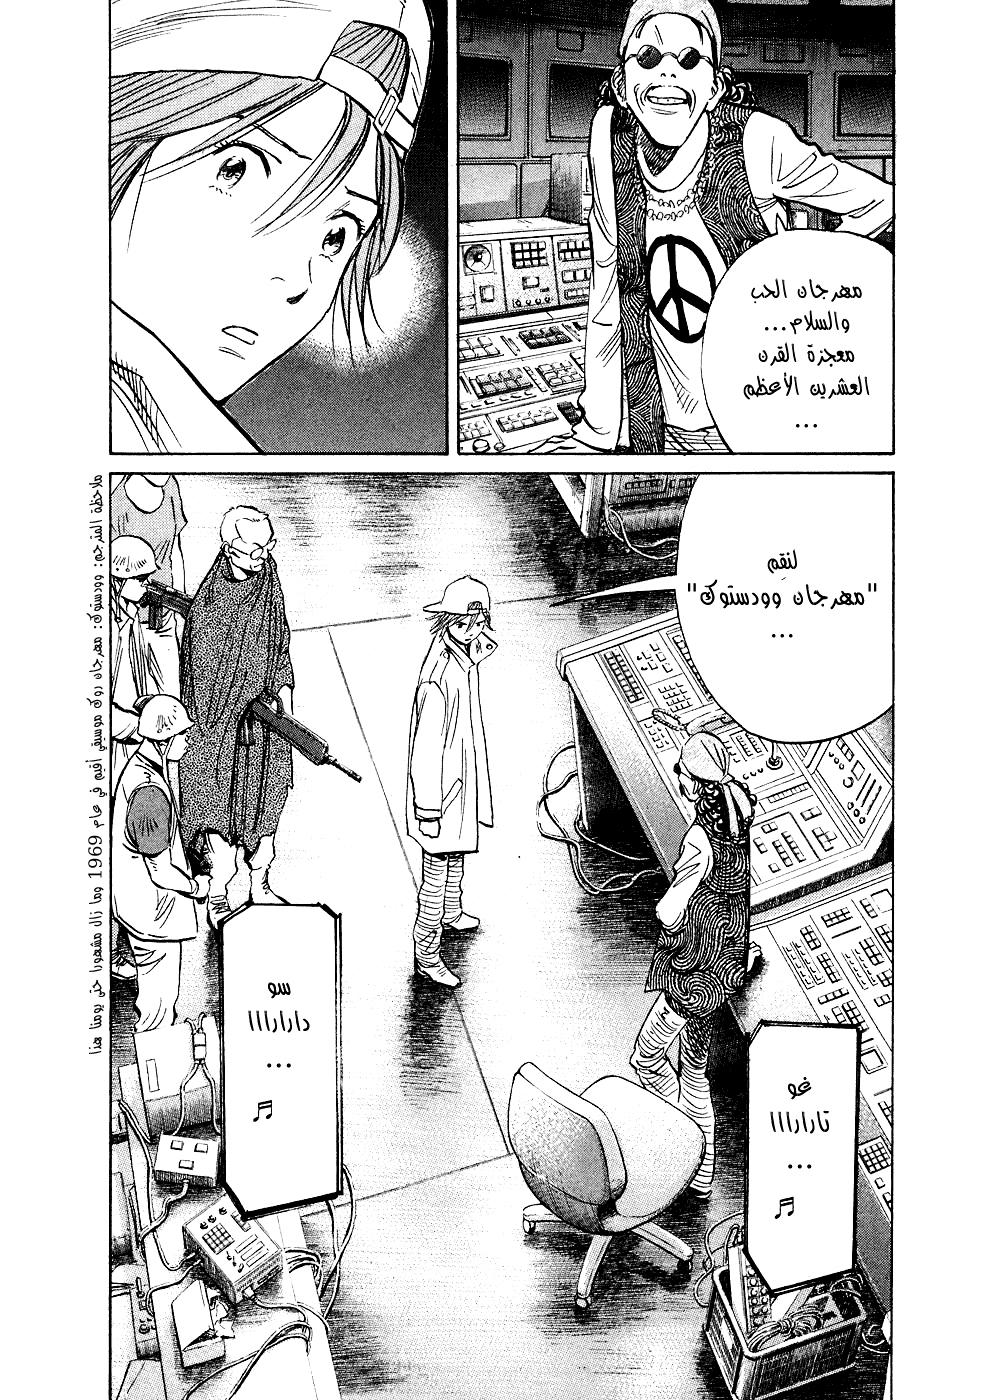 miley_cyrus_manga_mexat_00000000000000000000018